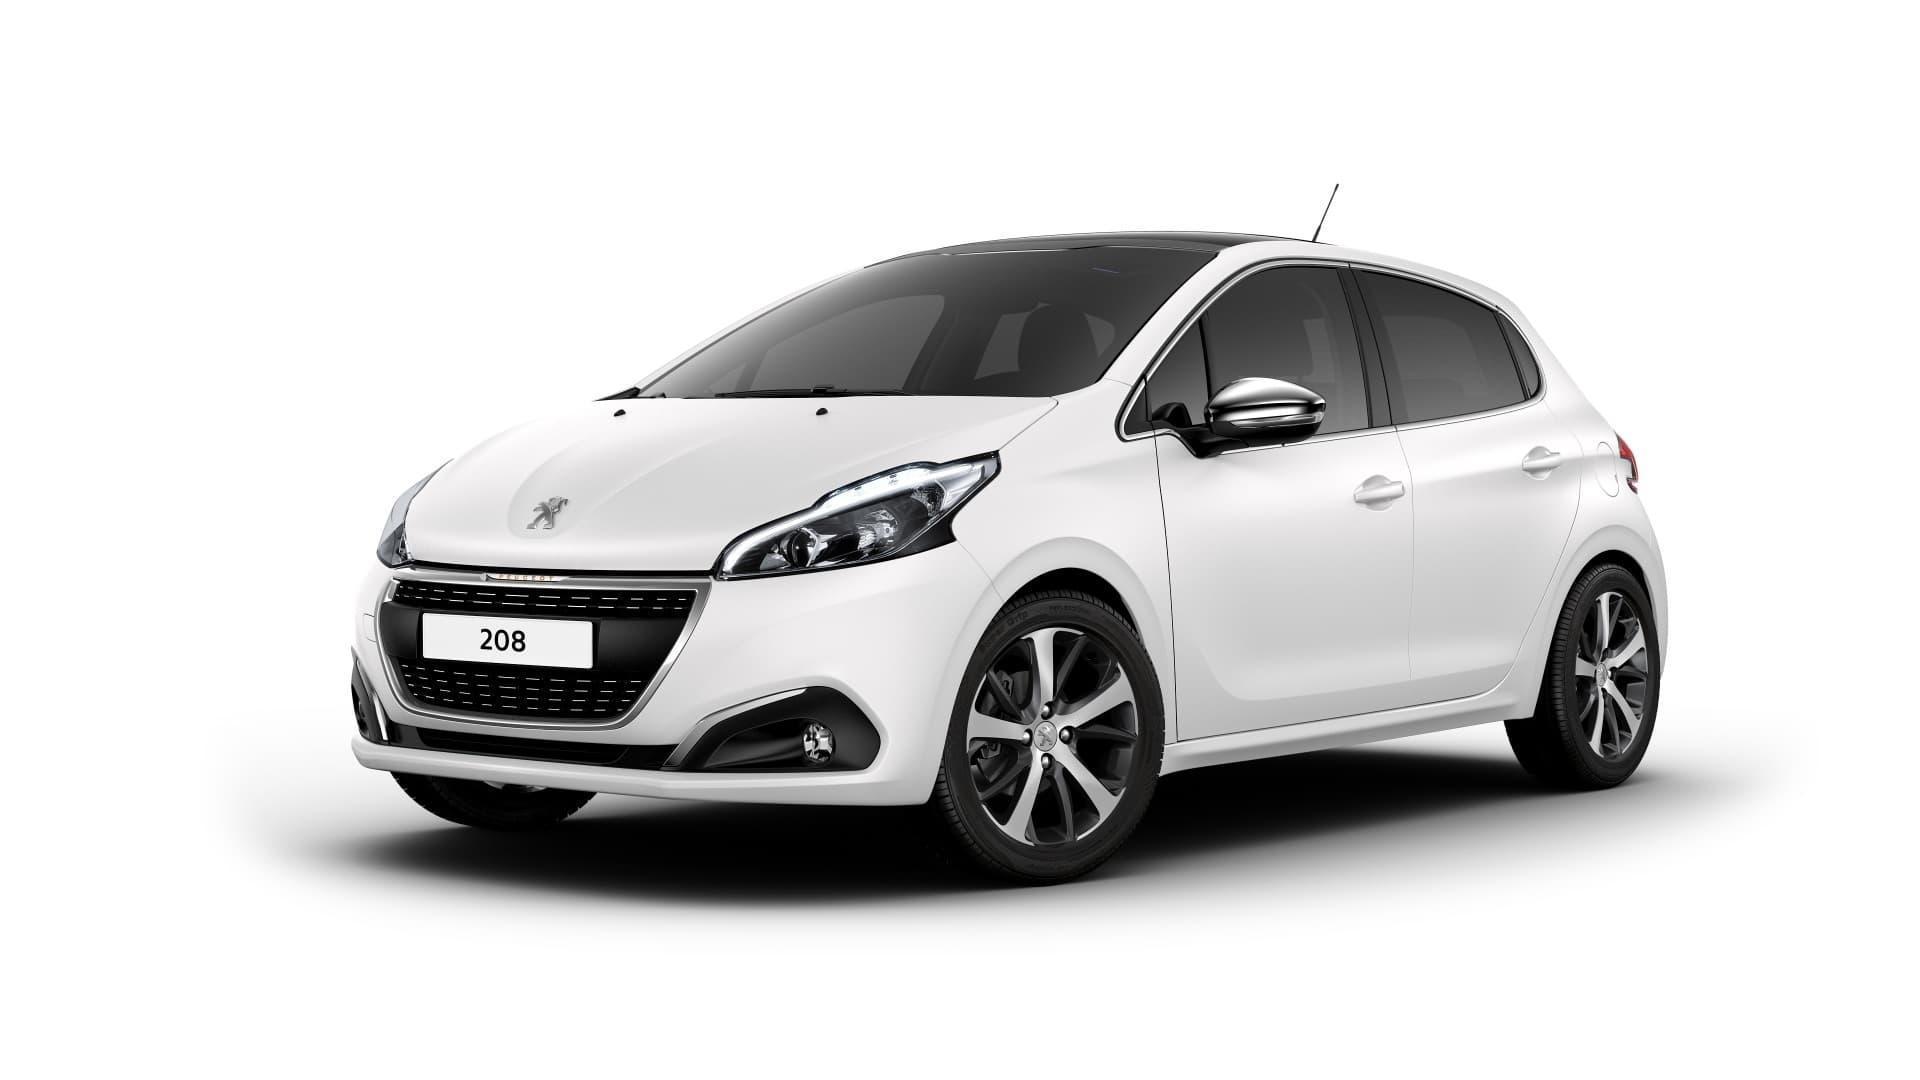 923874 Peugeot 208 Ice White